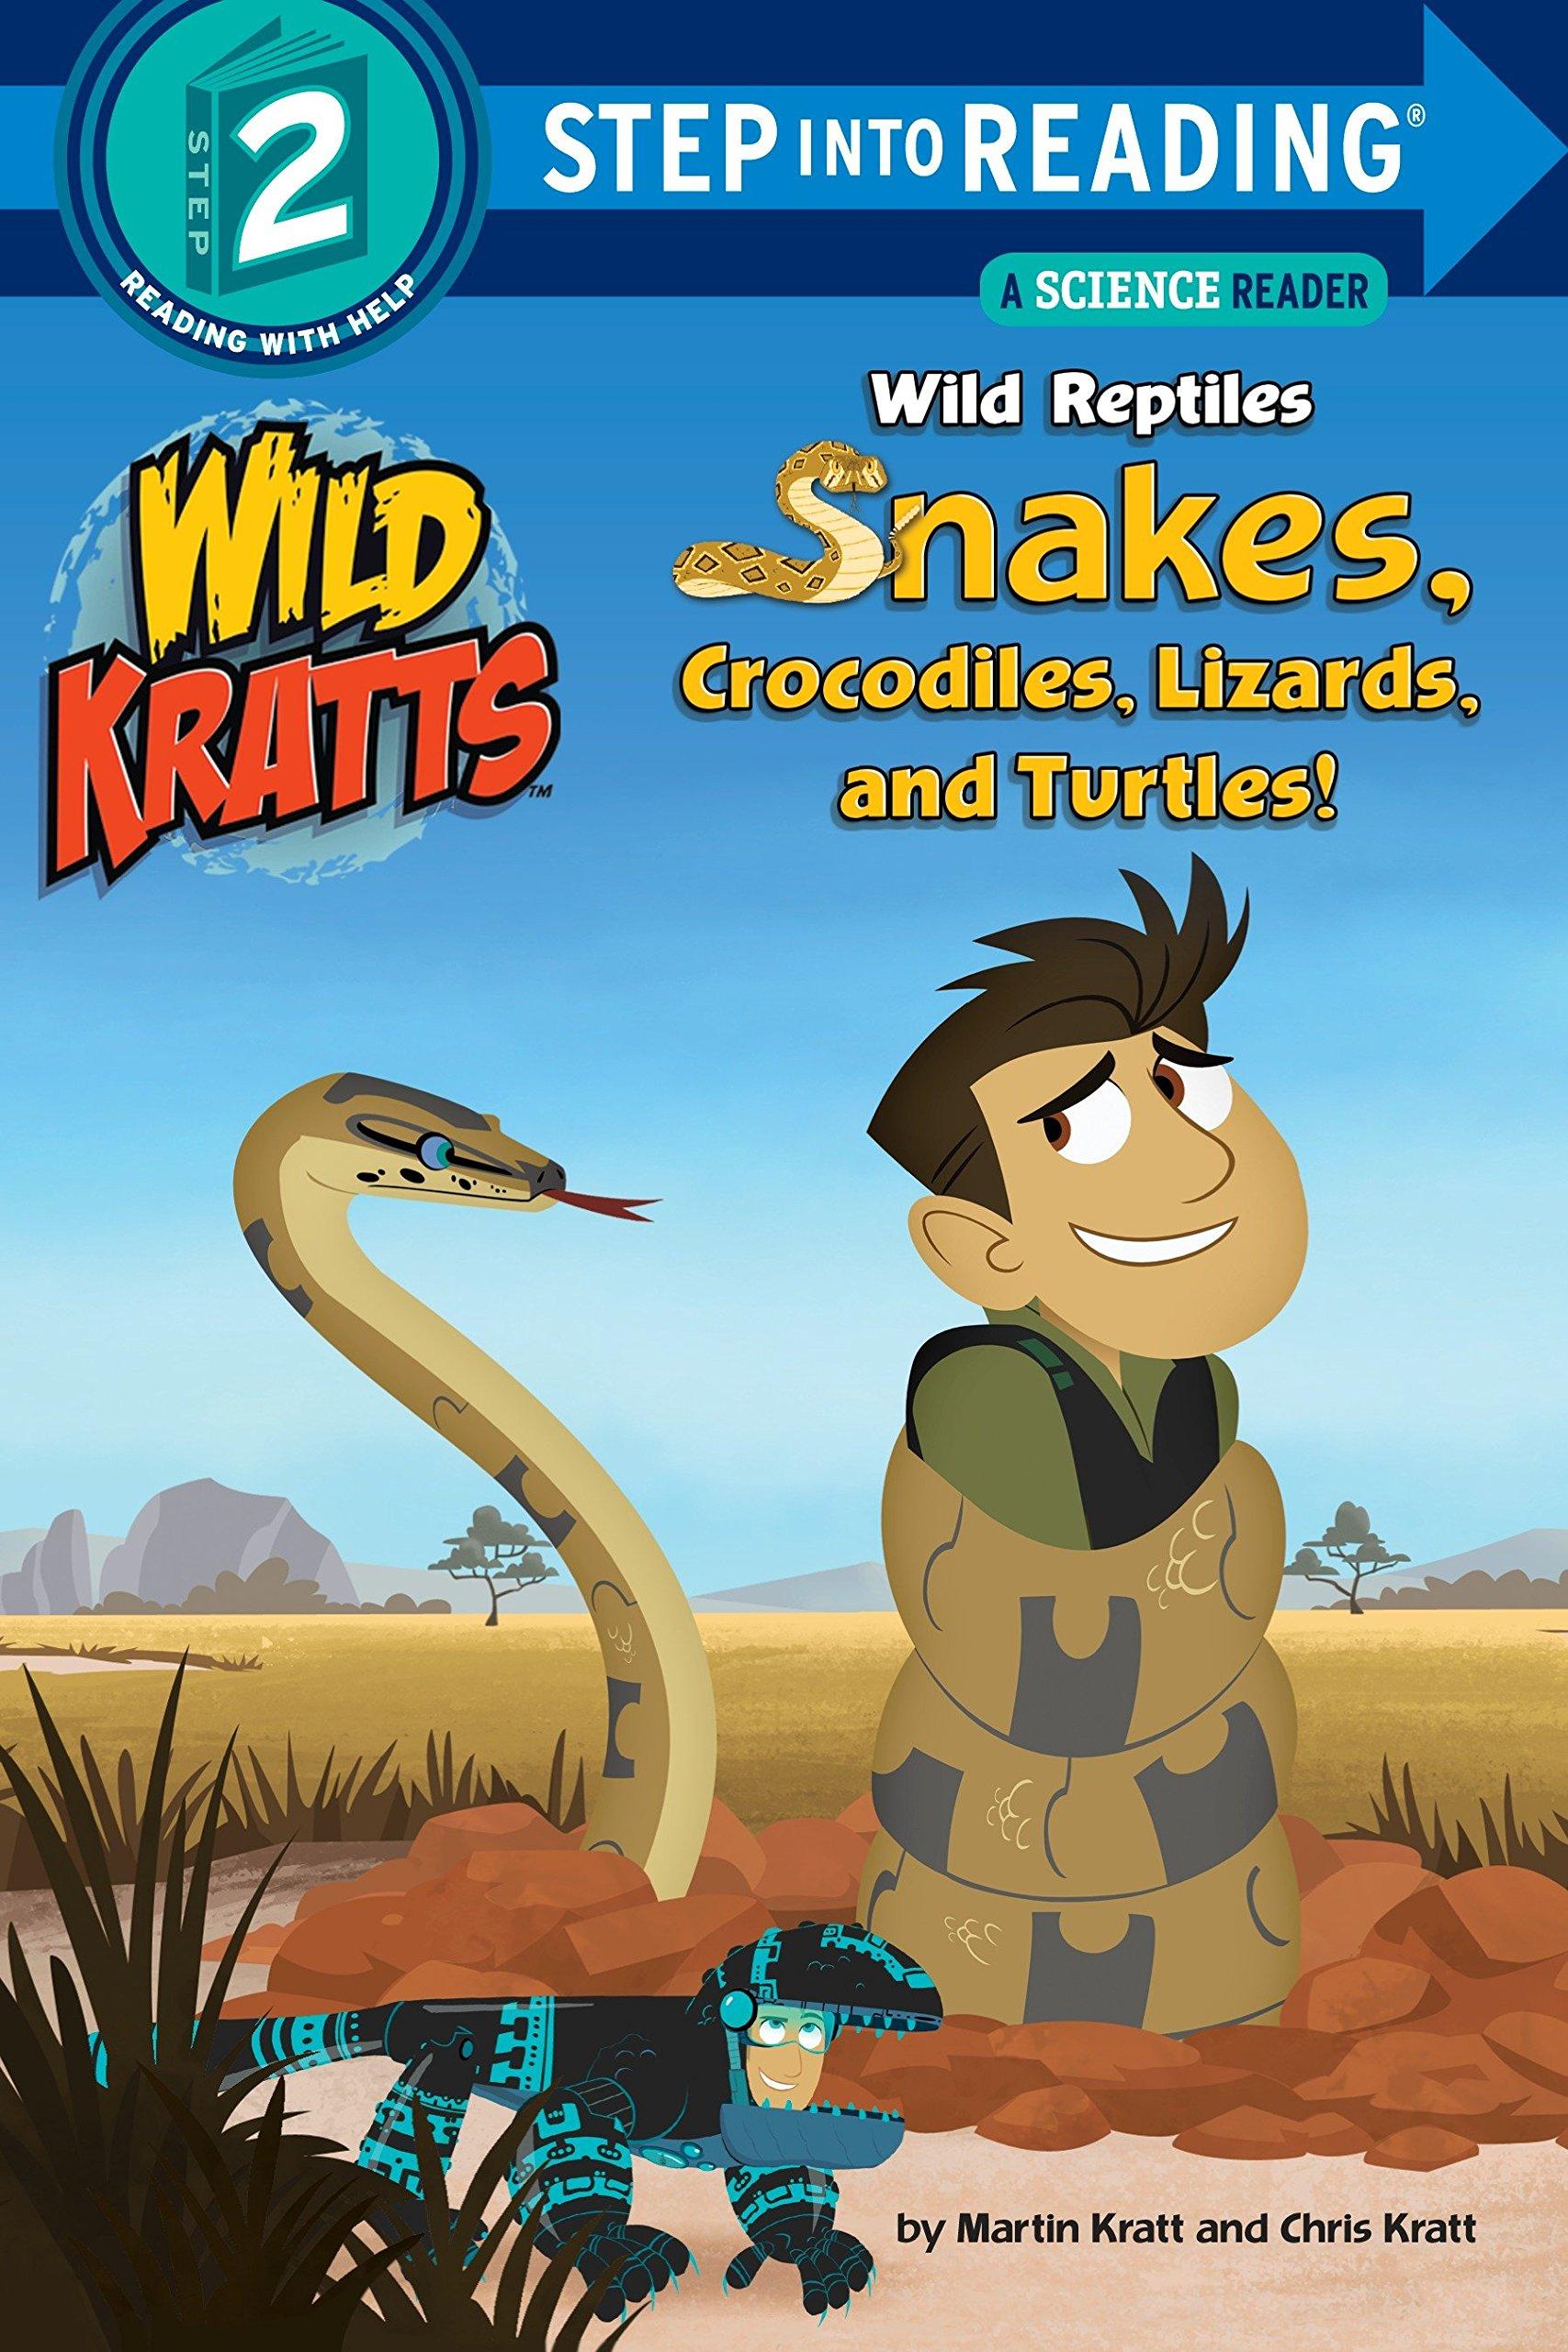 Wild Reptiles Snakes, Crocodiles, Lizards And Turtles Step Into Reading Lvl 2: Wild Kratts Step Into Reading, Step 2: Wild Kratts: Amazon.es: Kratt, Chris, Kratt, Martin: Libros en idiomas extranjeros